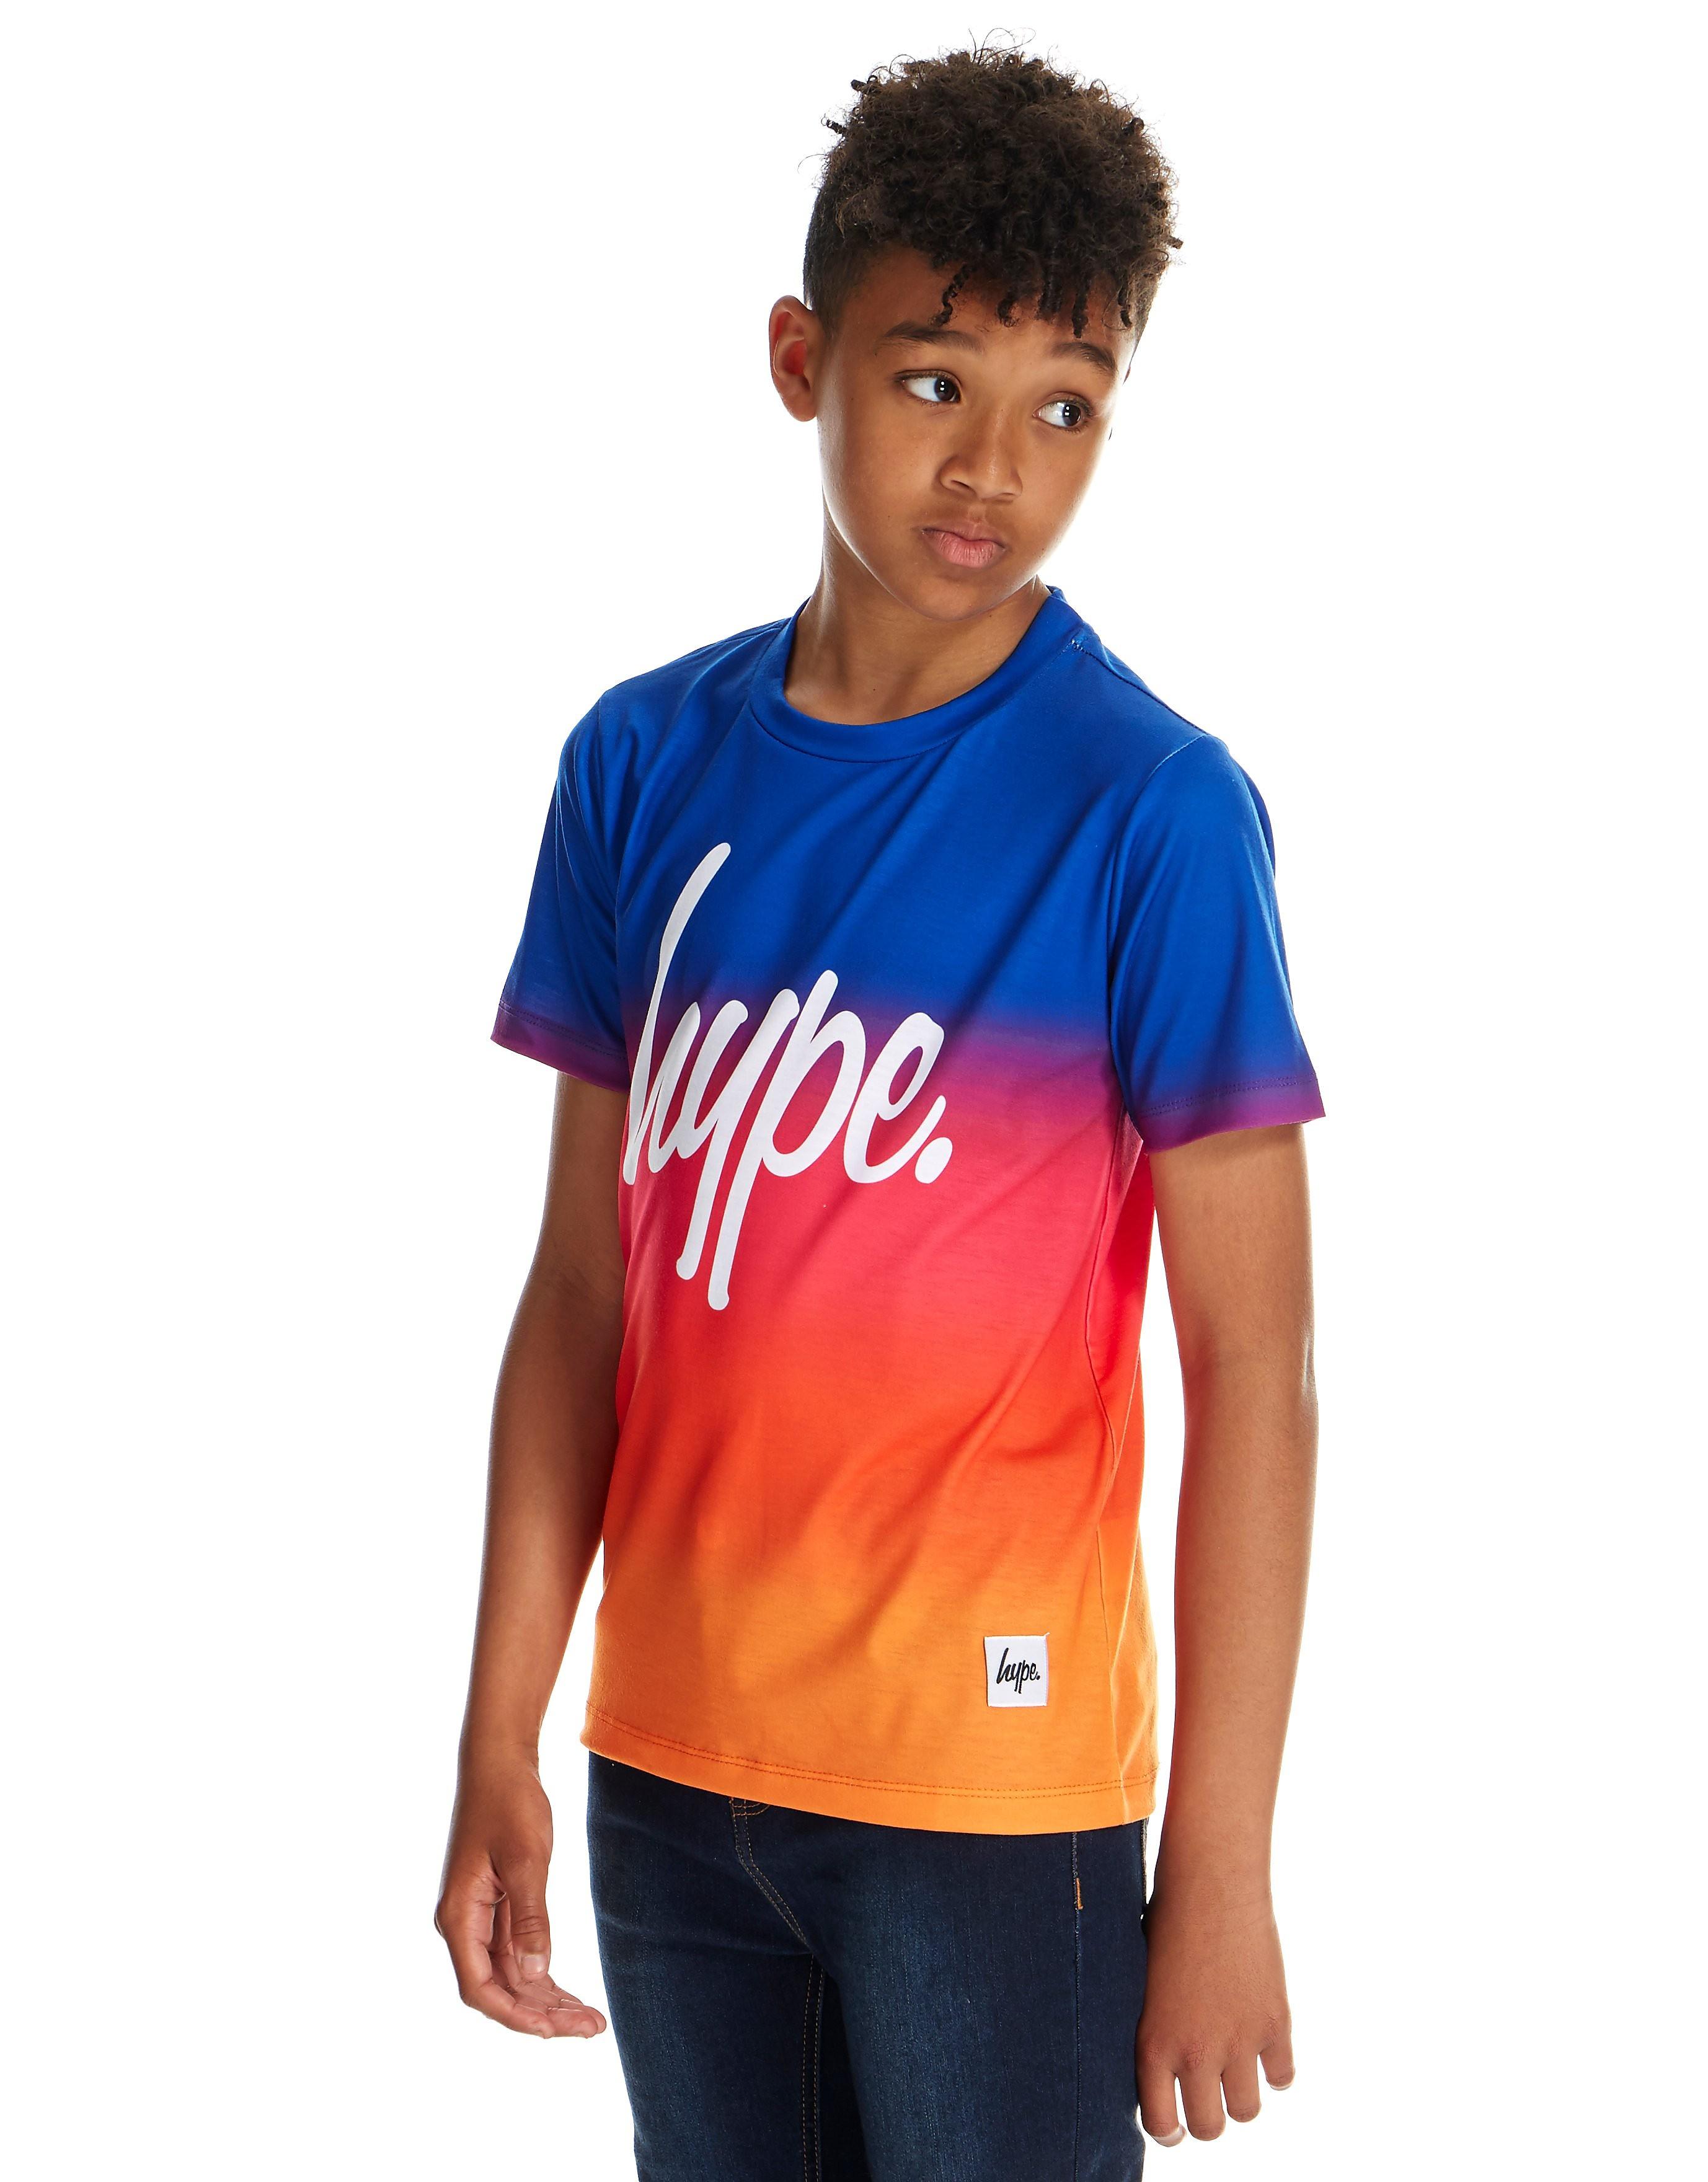 Hype T-shirt Gradient junior - Multicolour, Multicolour